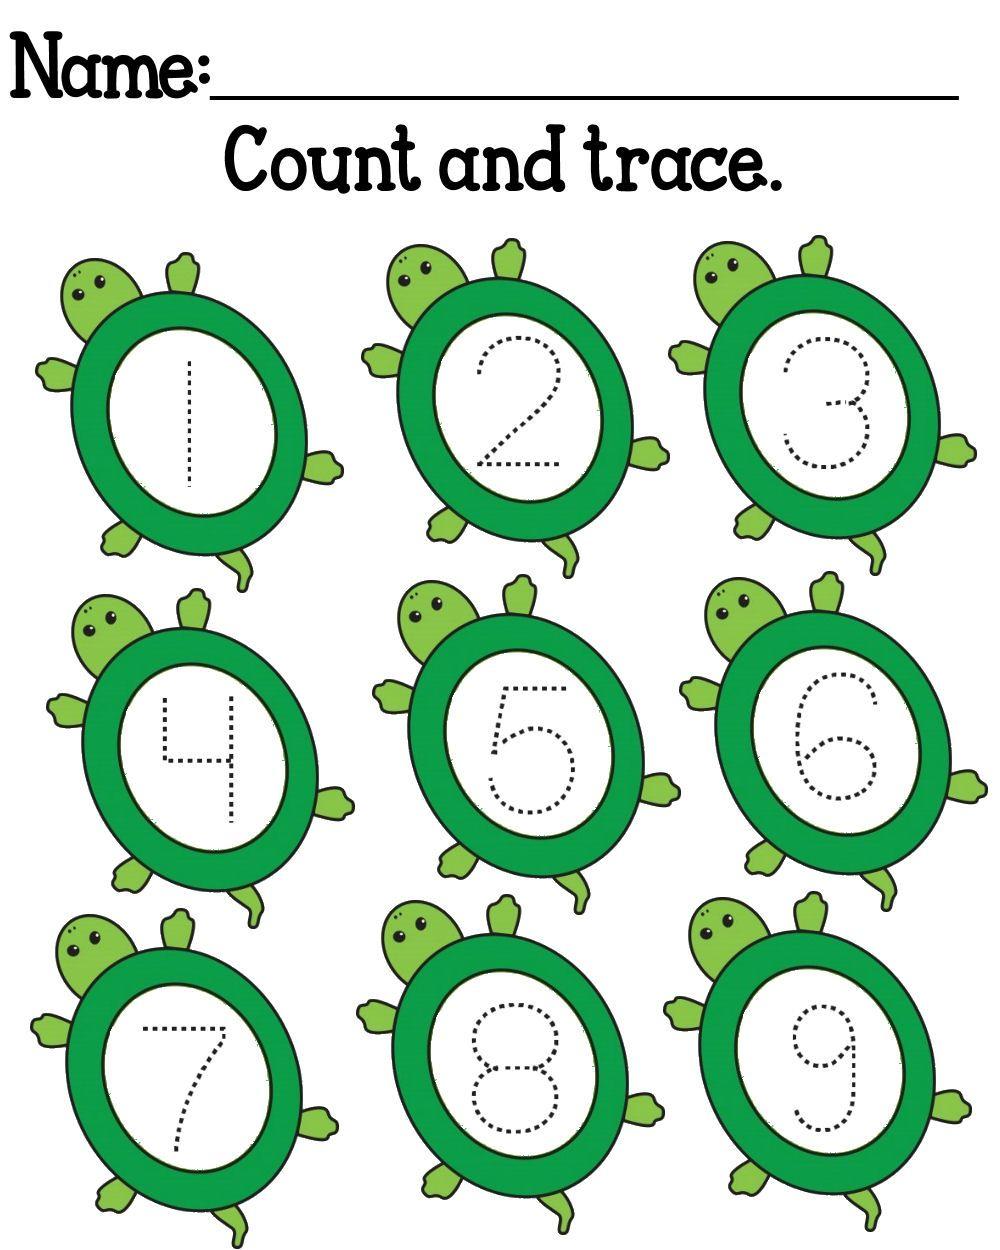 Free Yertle The Turtle Printables | Mysunwillshine | Reptile And | Free Printable Reptile Worksheets